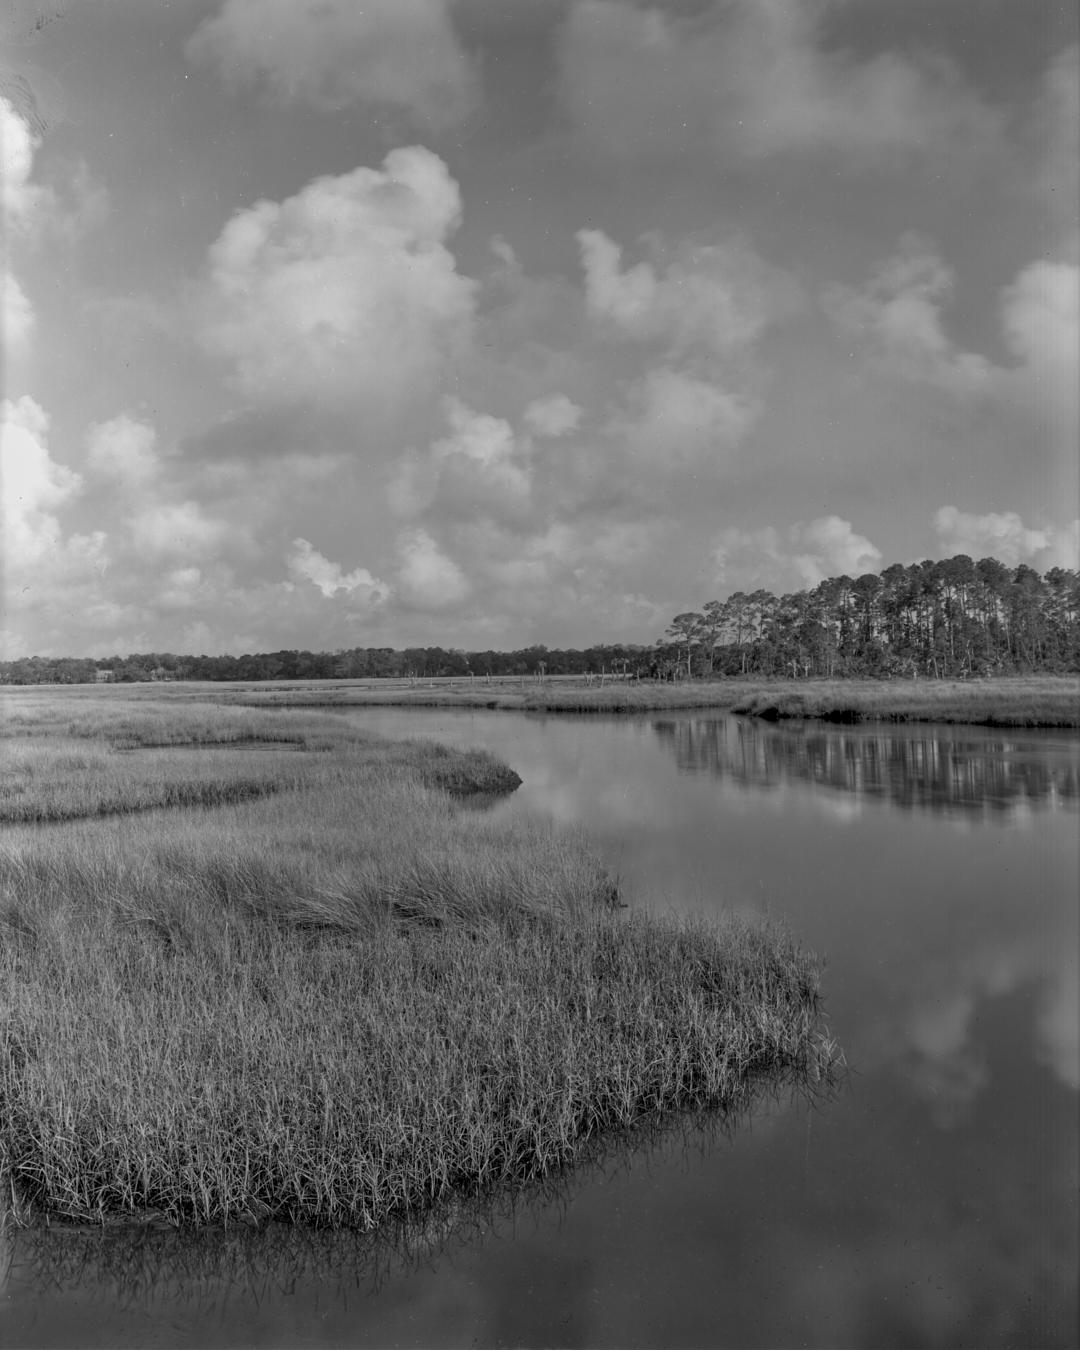 Dutton Island Marsh